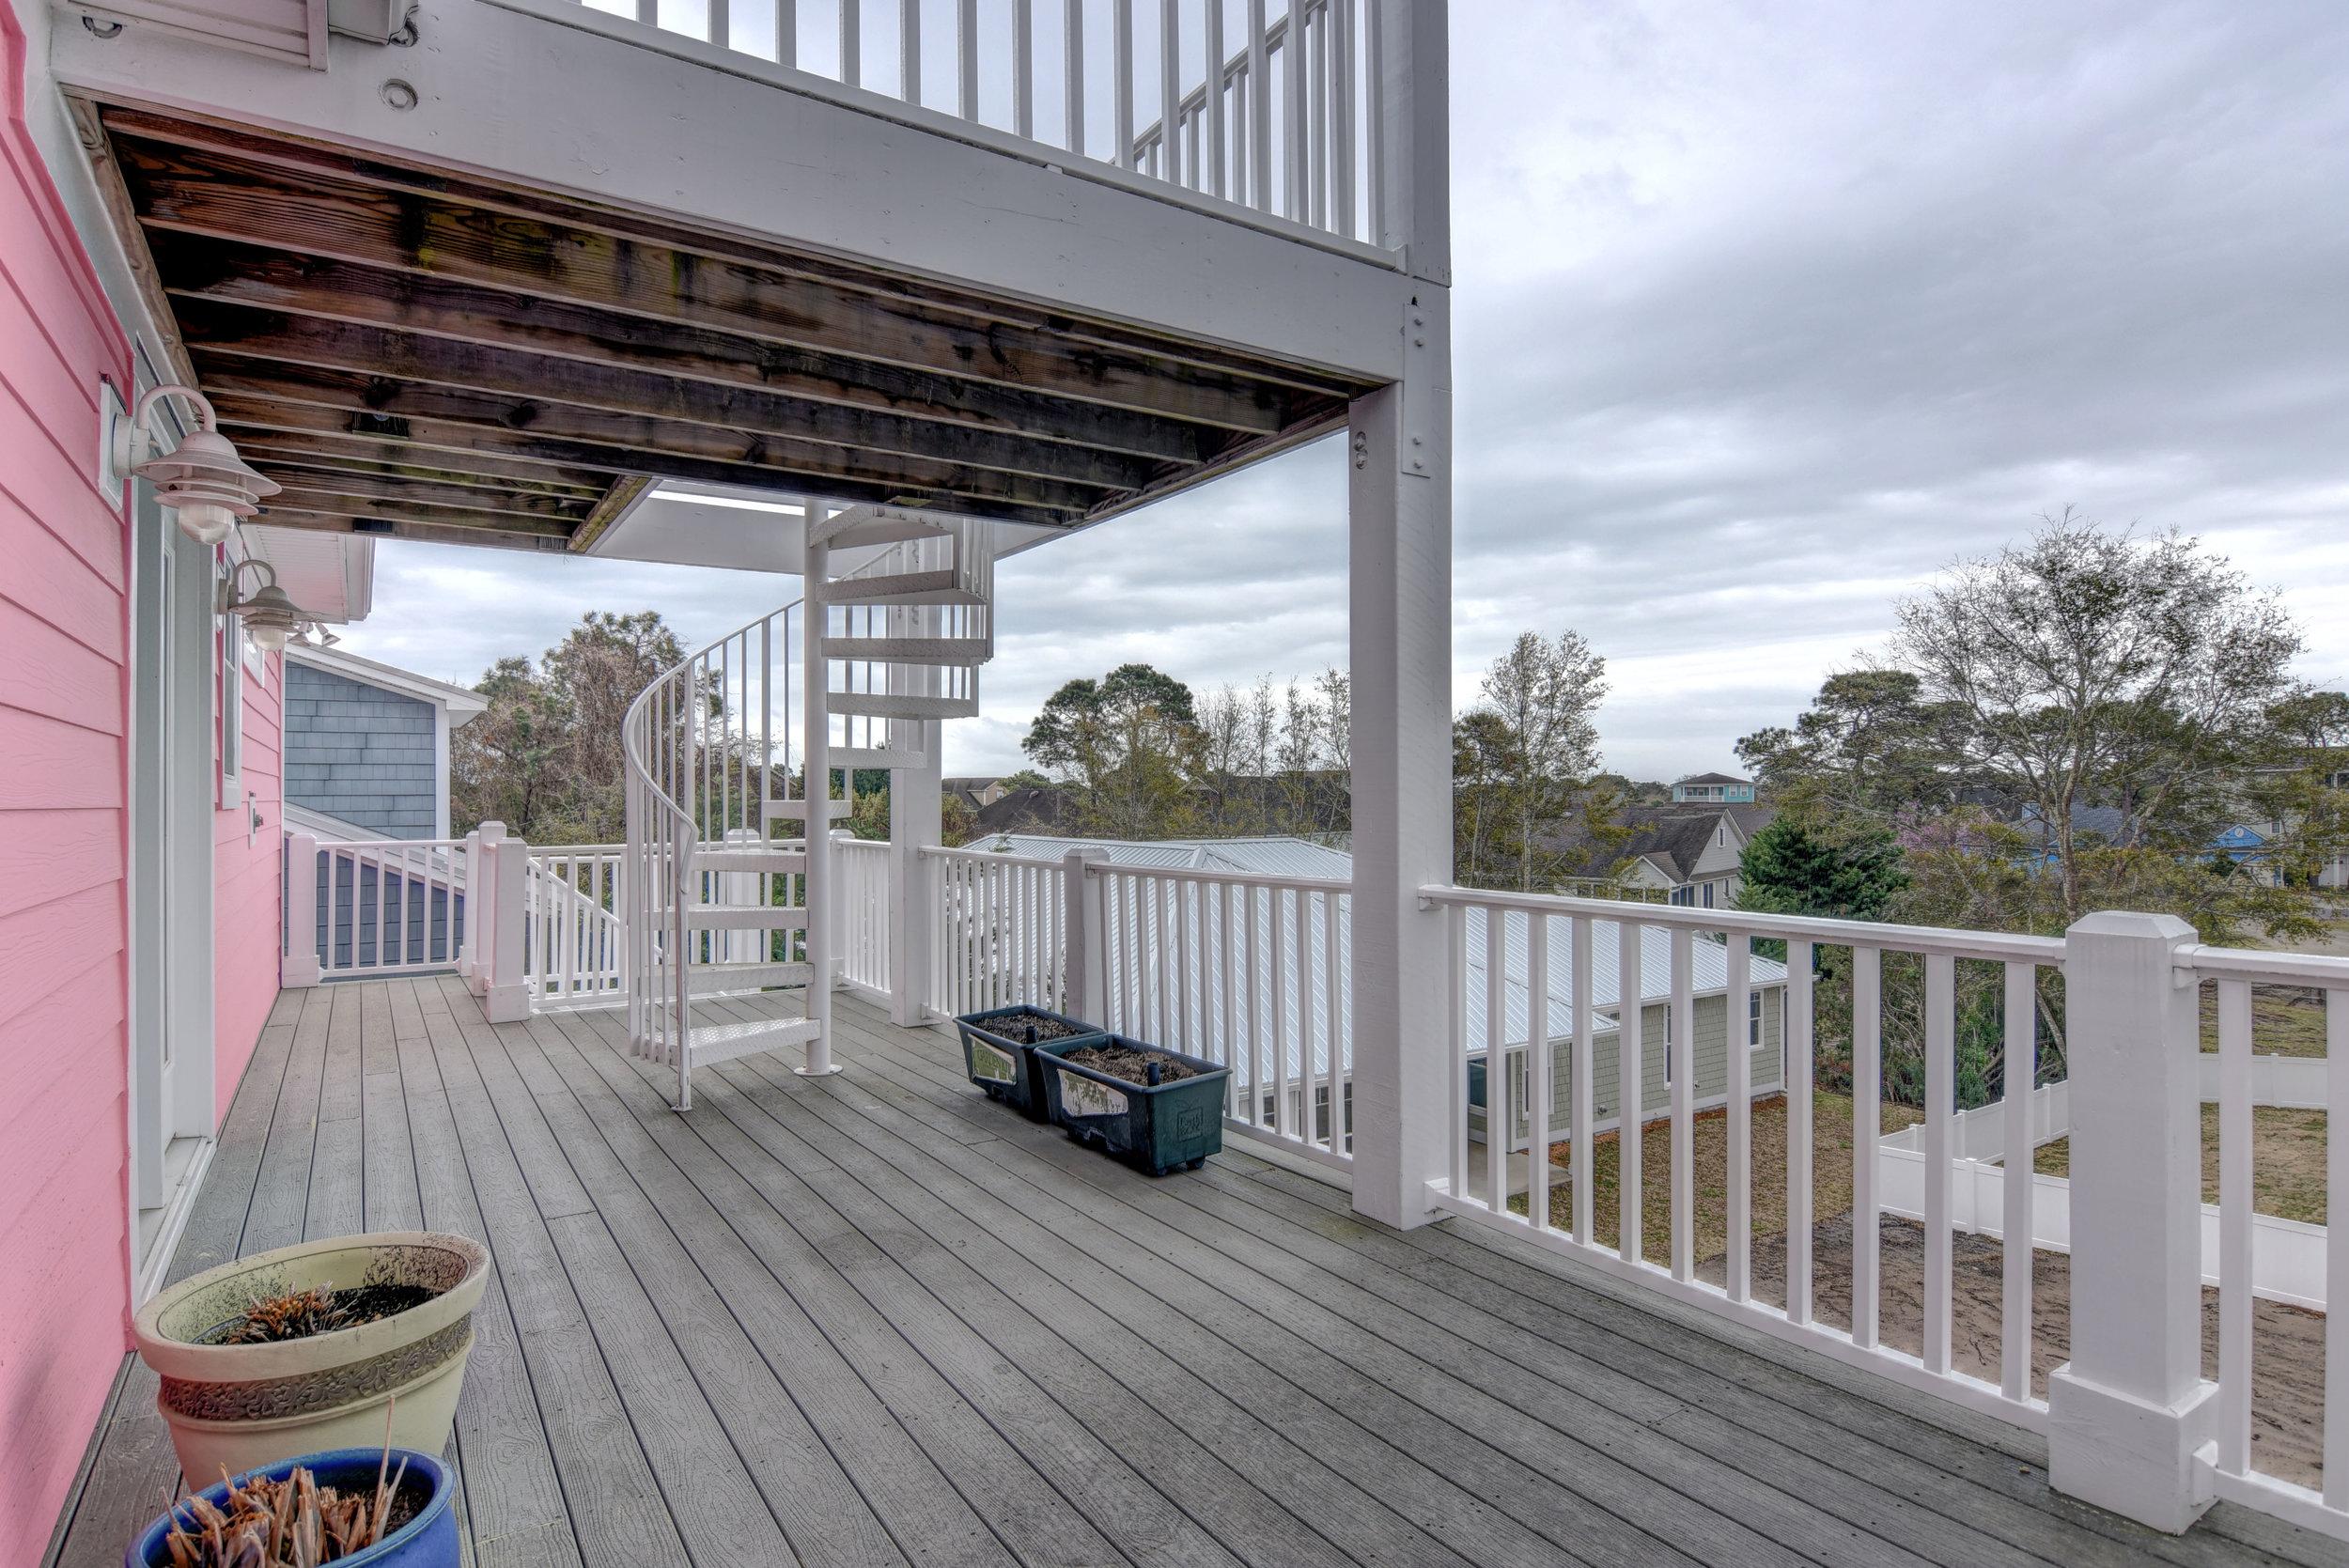 805 Mississippi Ave Kure Beach-print-032-29-DSC 3111 2 3-4200x2804-300dpi.jpg